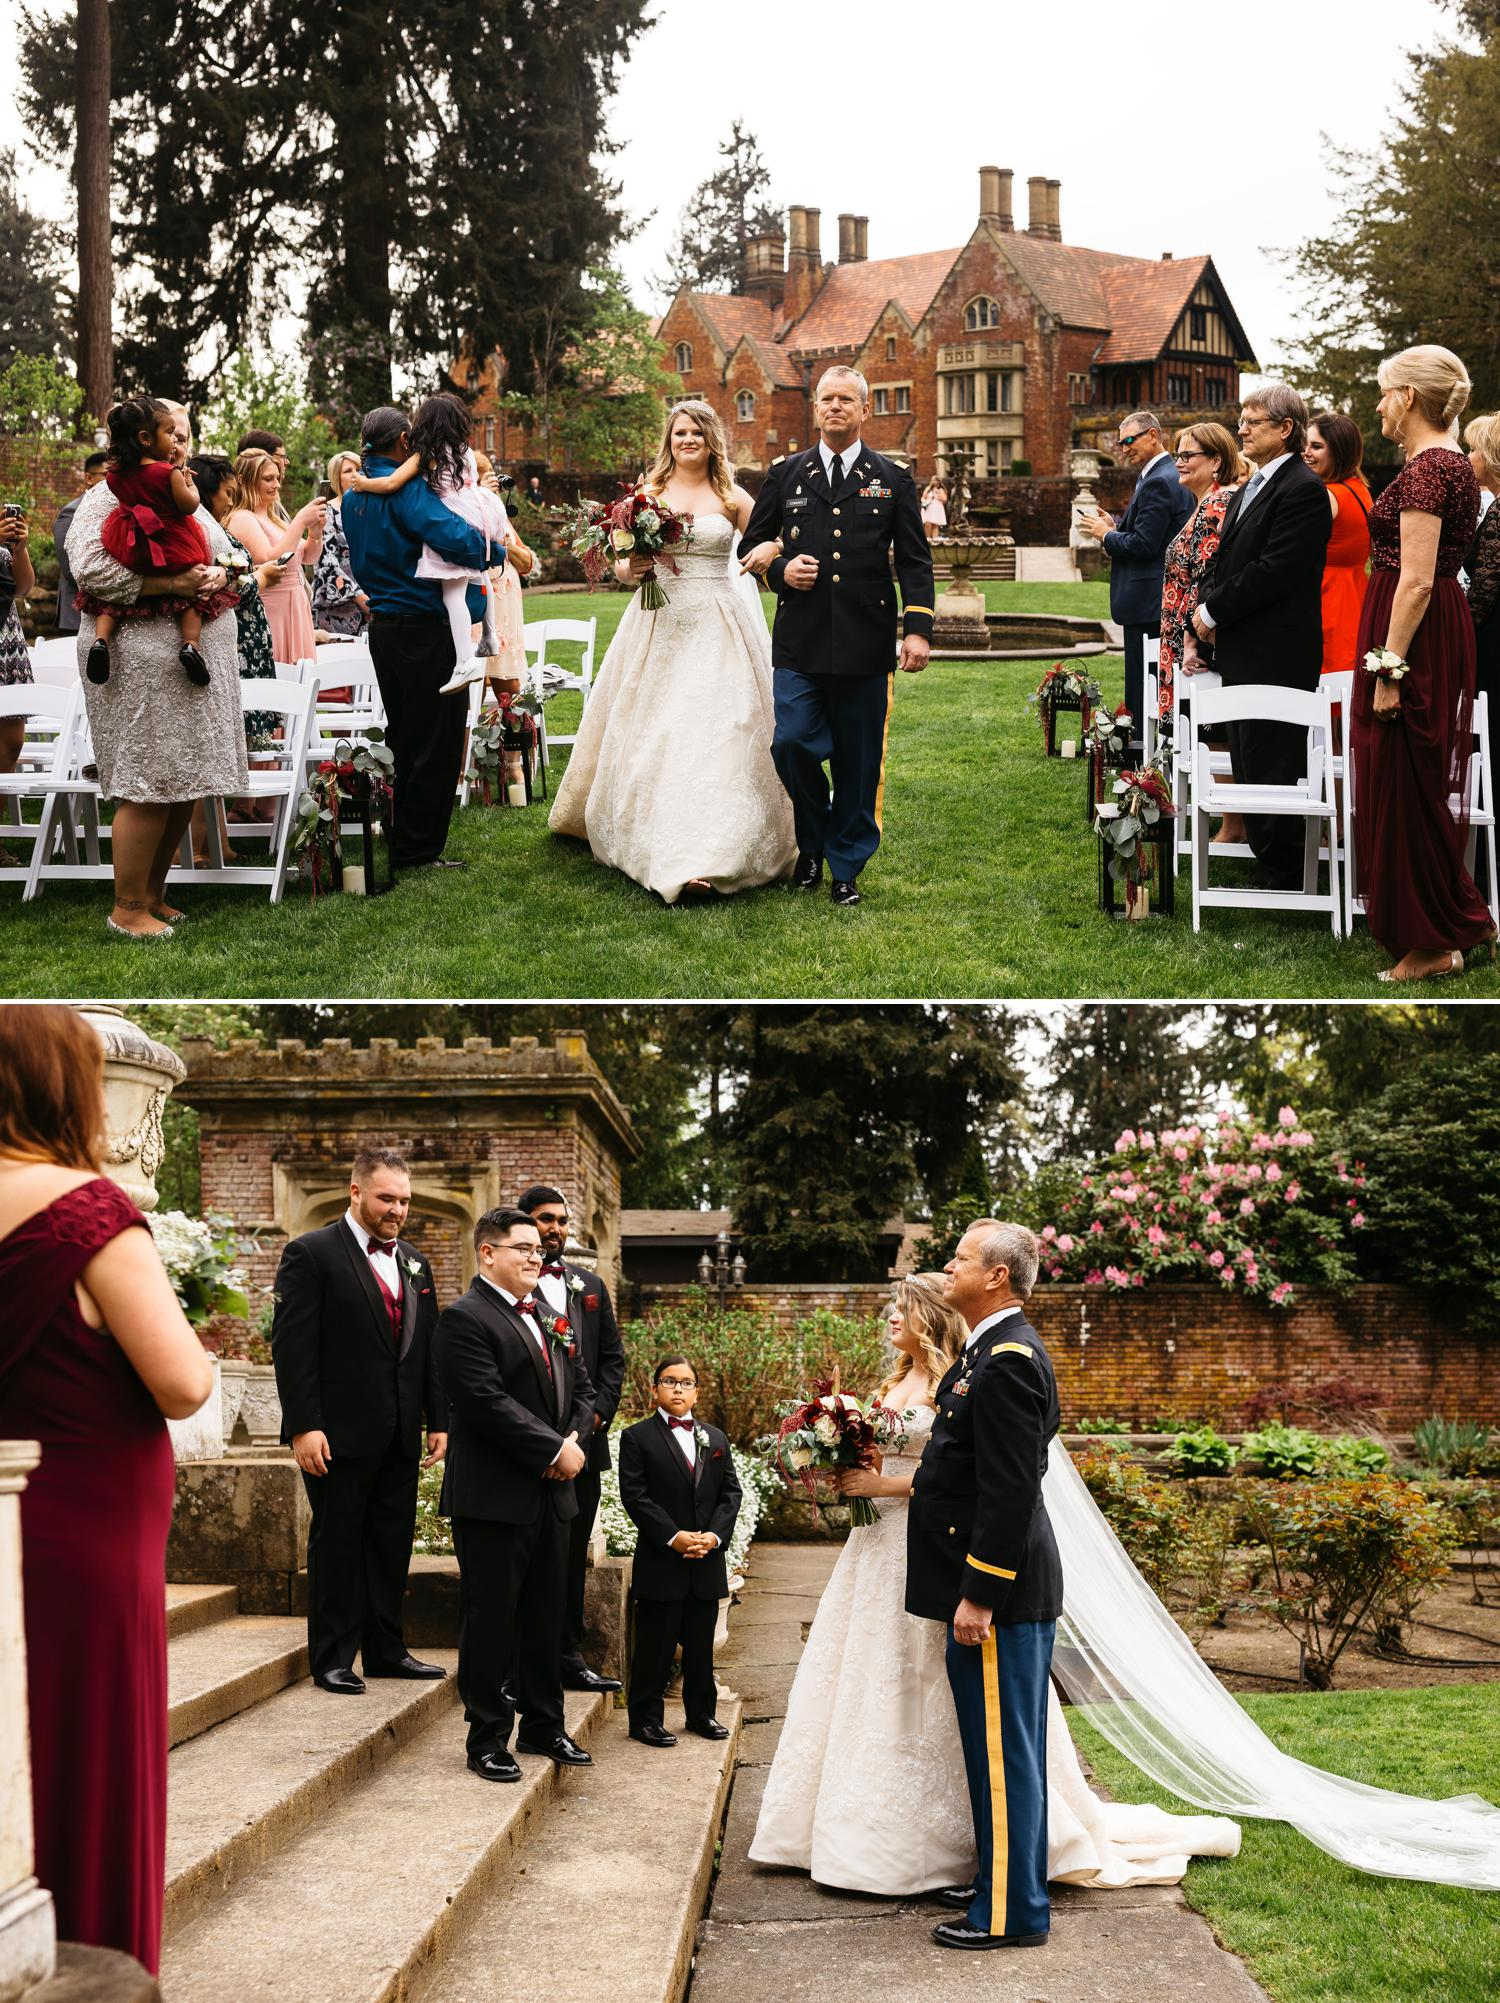 thornewood castle outdoor wedding ceremony